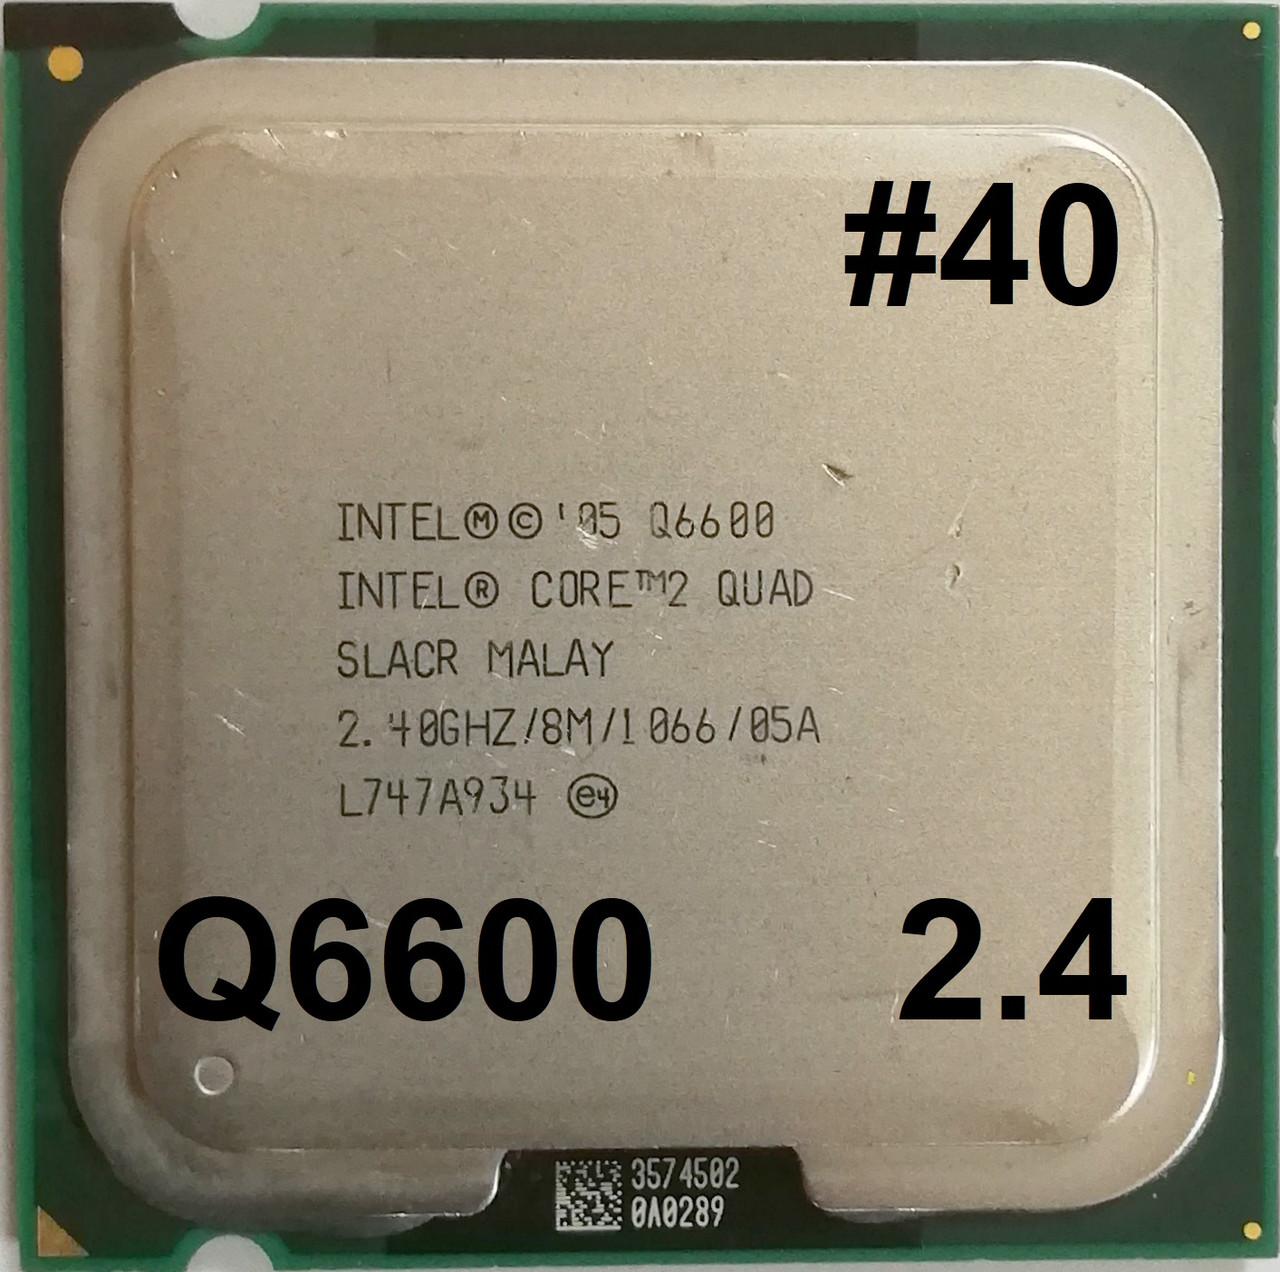 Процессор ЛОТ#40 Intel Core 2 Quad Q6600 SLACR 2.4GHz 8M Cache 1066 MHz FSB Socket 775 Б/У